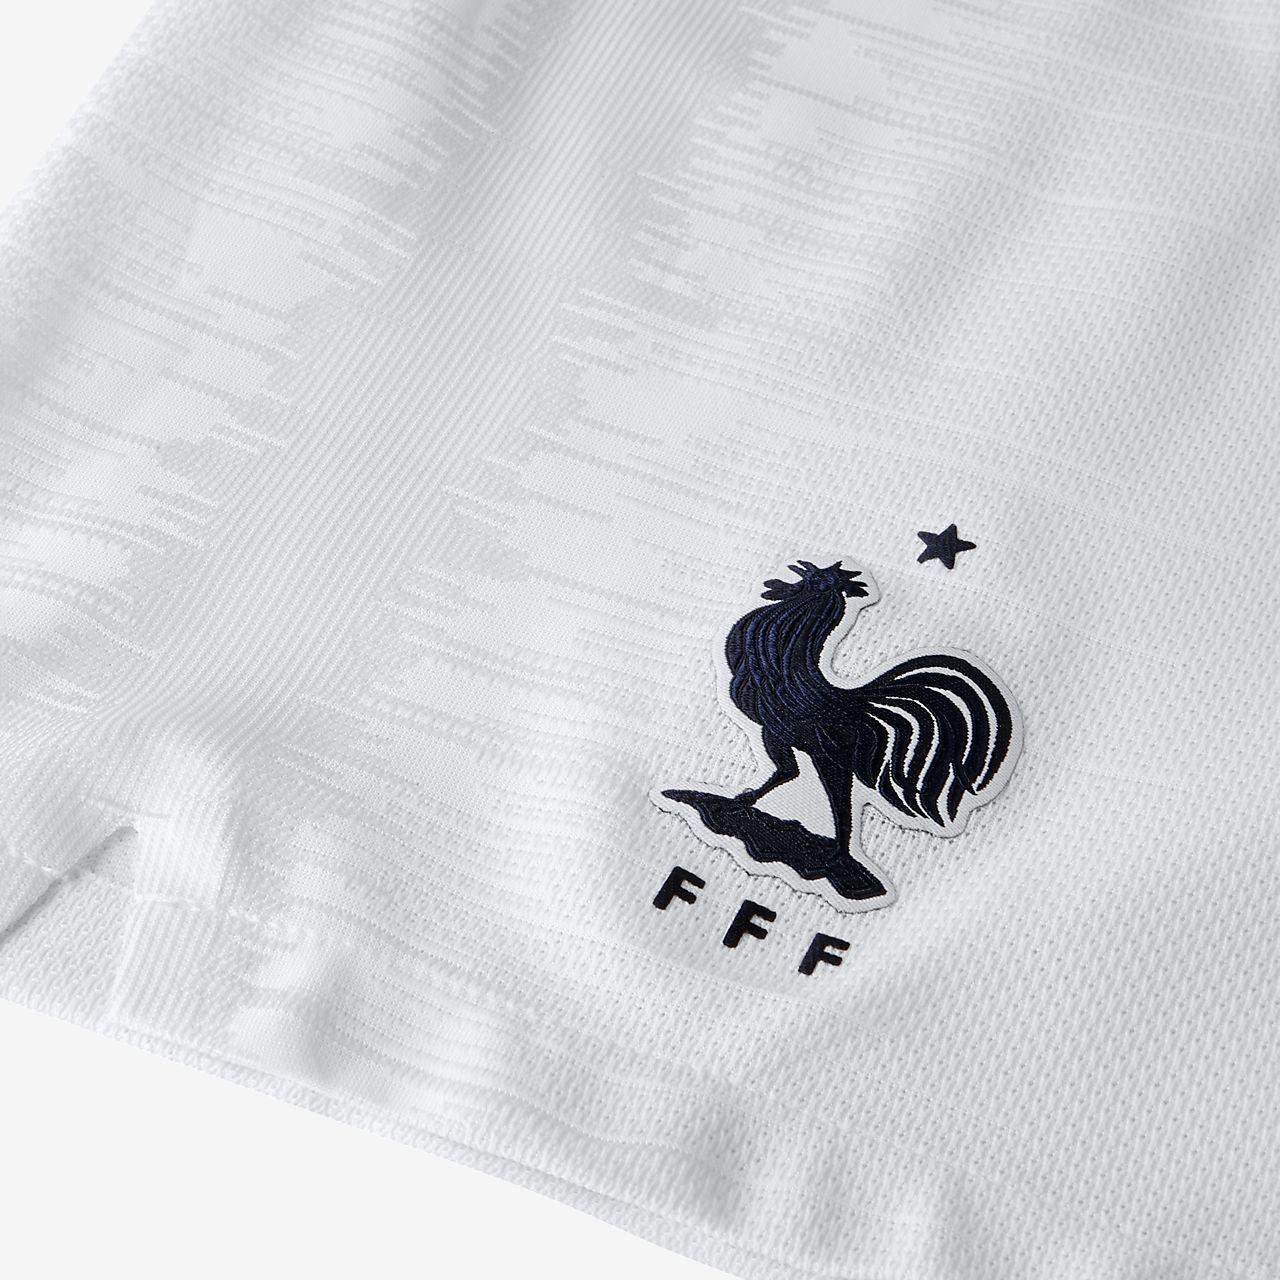 0056cea2 2018 FFF Vapor Match Home Men's Football Shorts. Nike.com SI